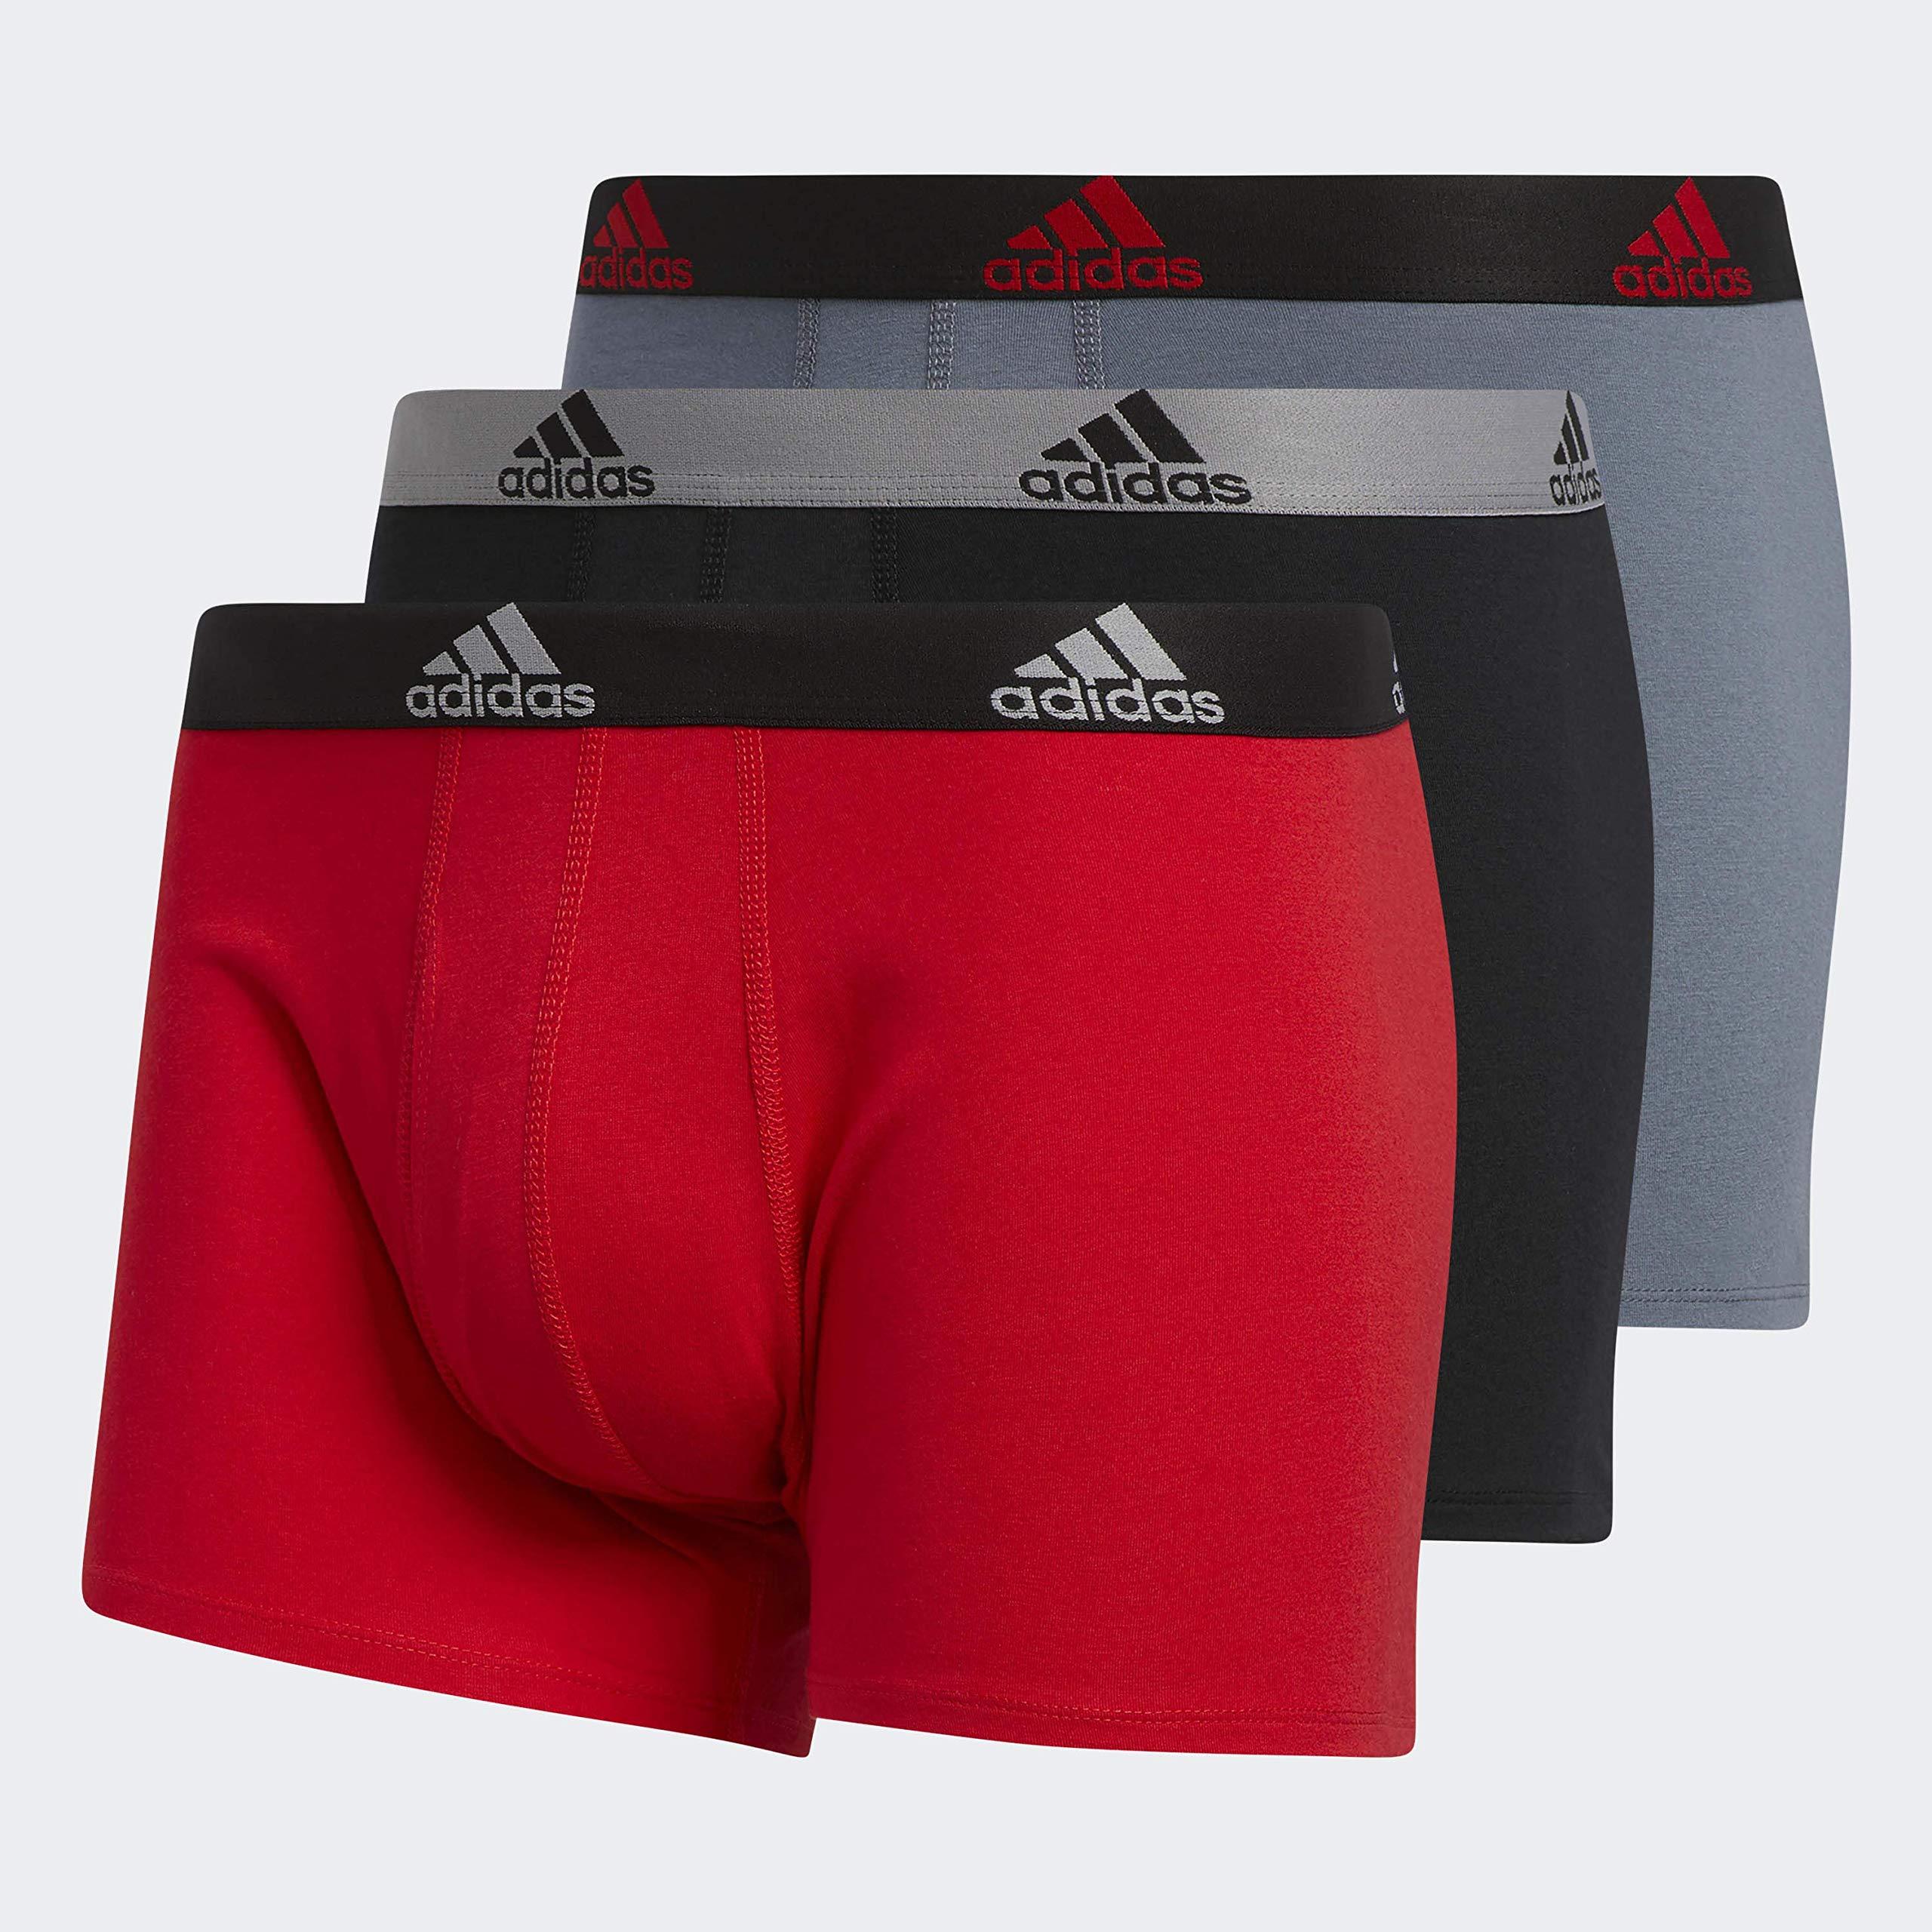 adidas Men's Stretch Cotton Trunk Underwear (3-Pack), Scarlet/Black Black/Grey Onix/Black, SMALL by adidas